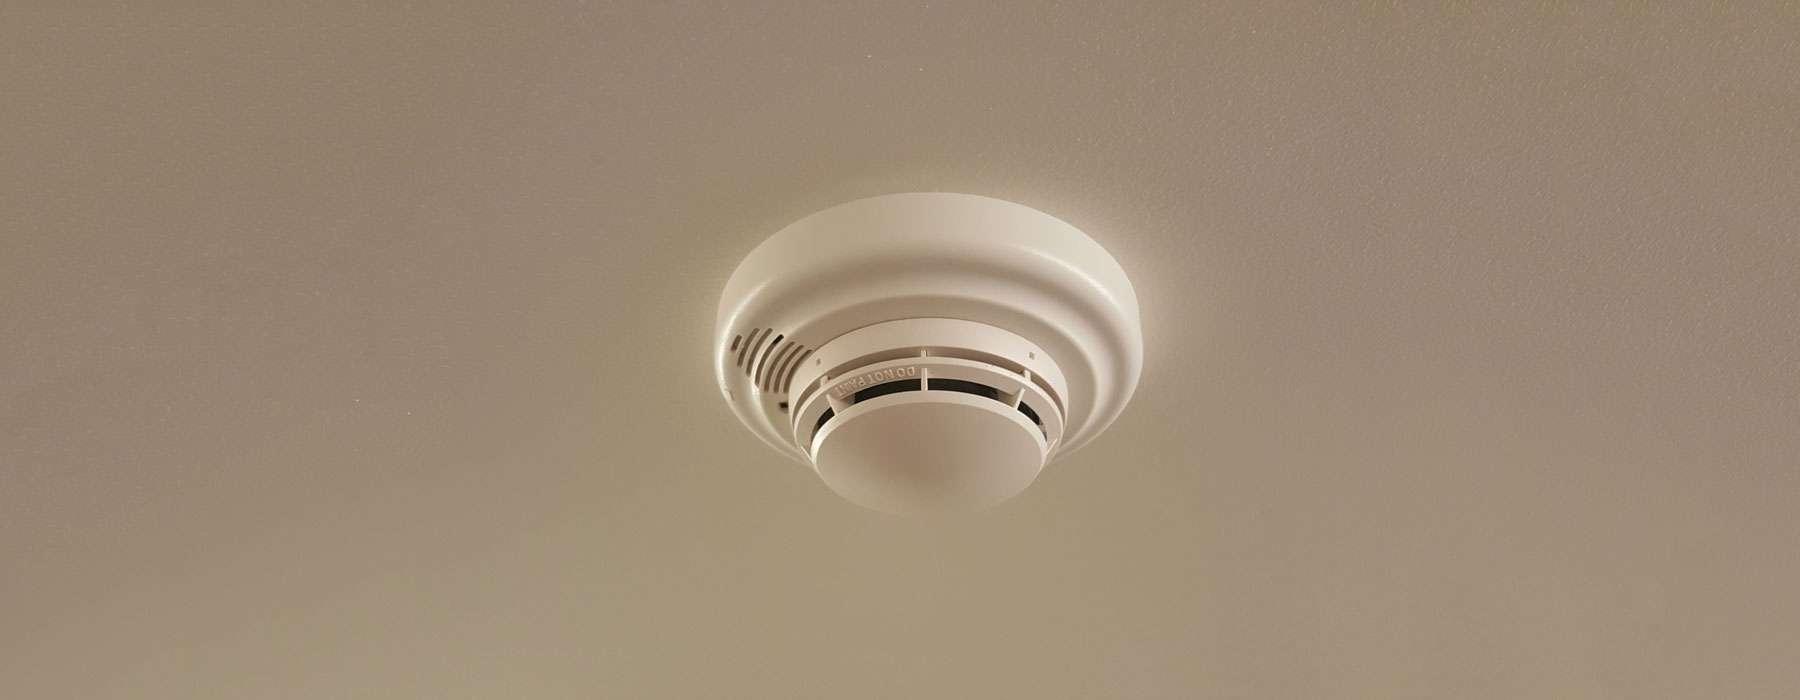 Requirements For Residential Smoke Carbon Monoxide Detectors